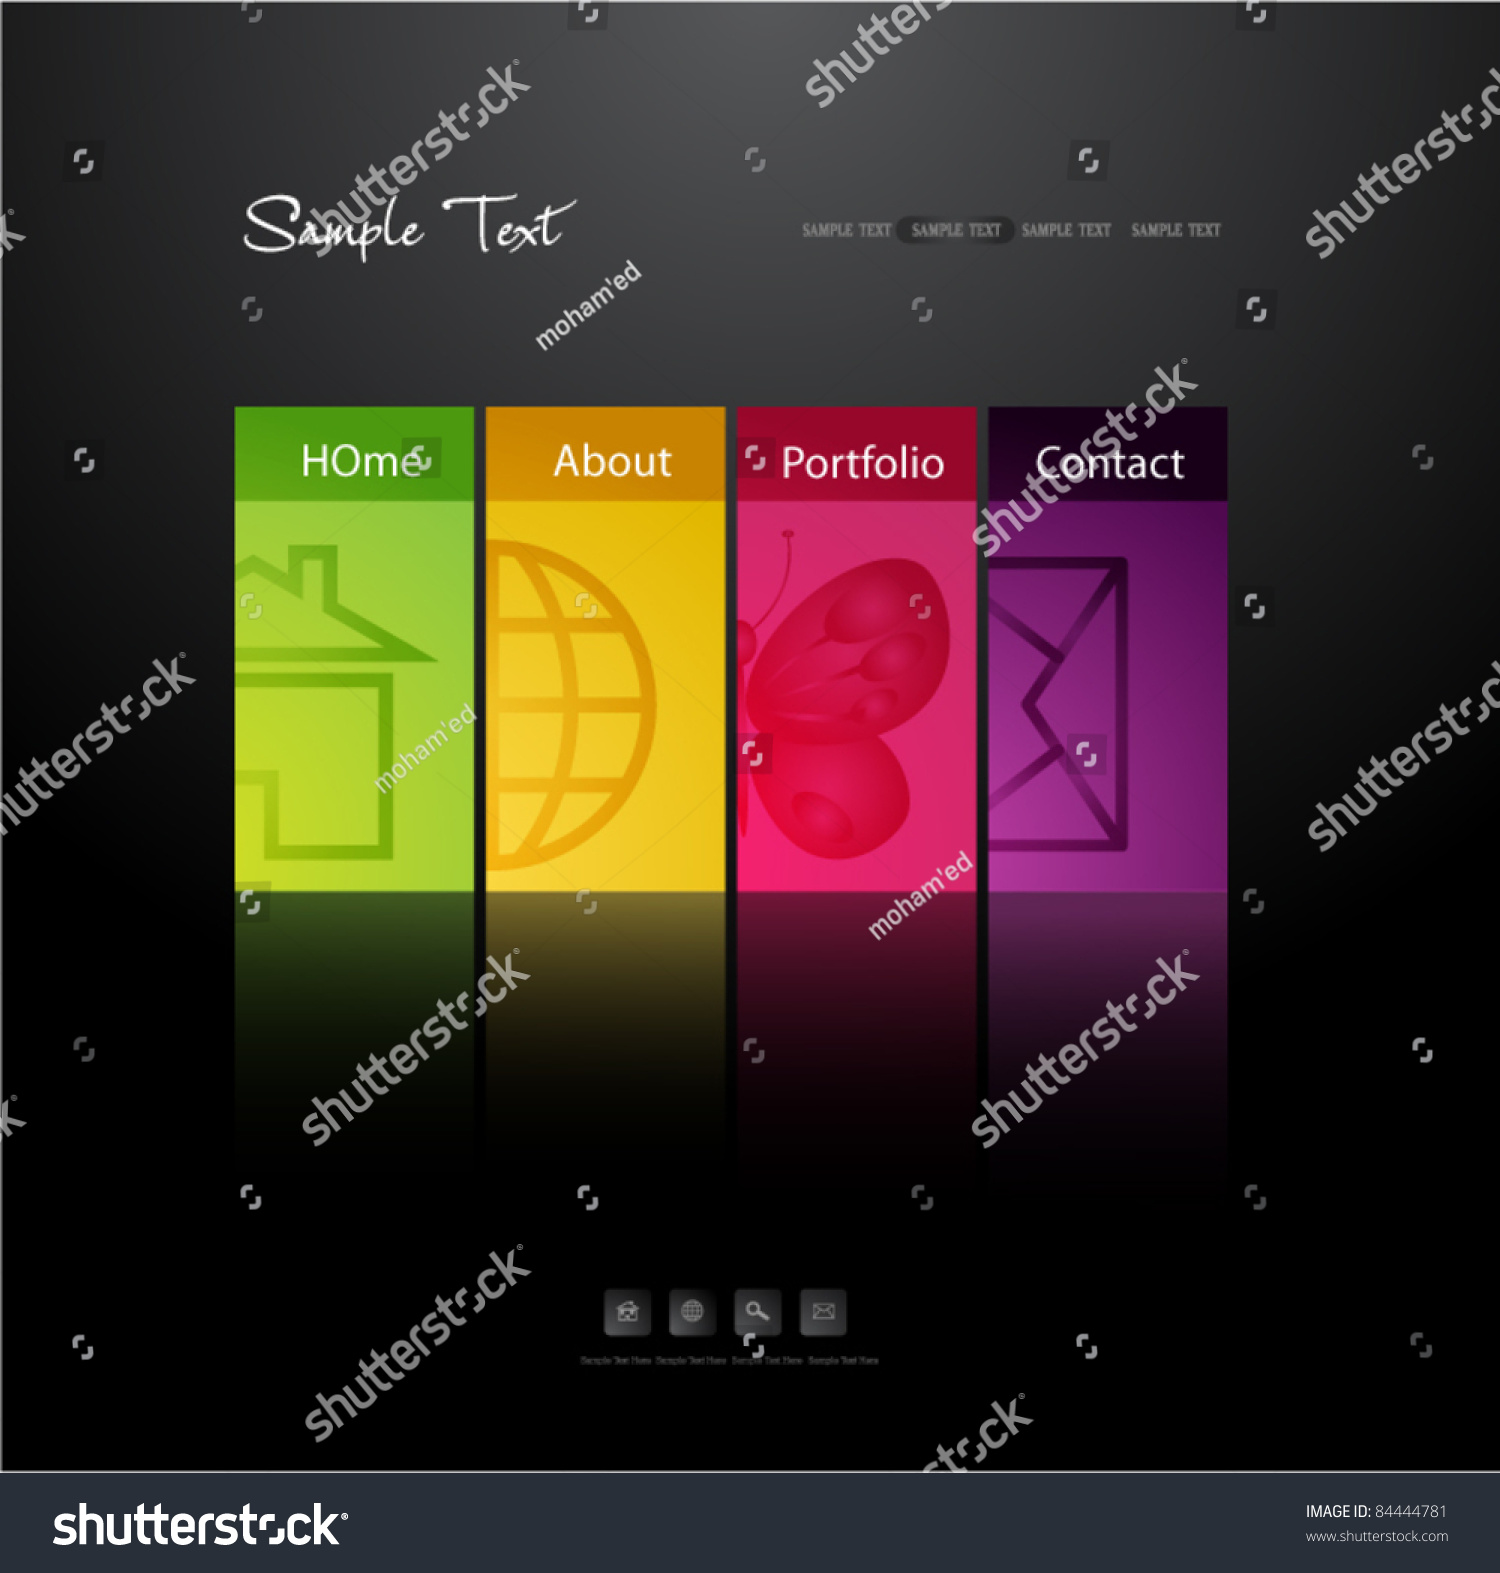 Vector Illustration Web Designs: Modern Web Design Template Stock Vector Illustration